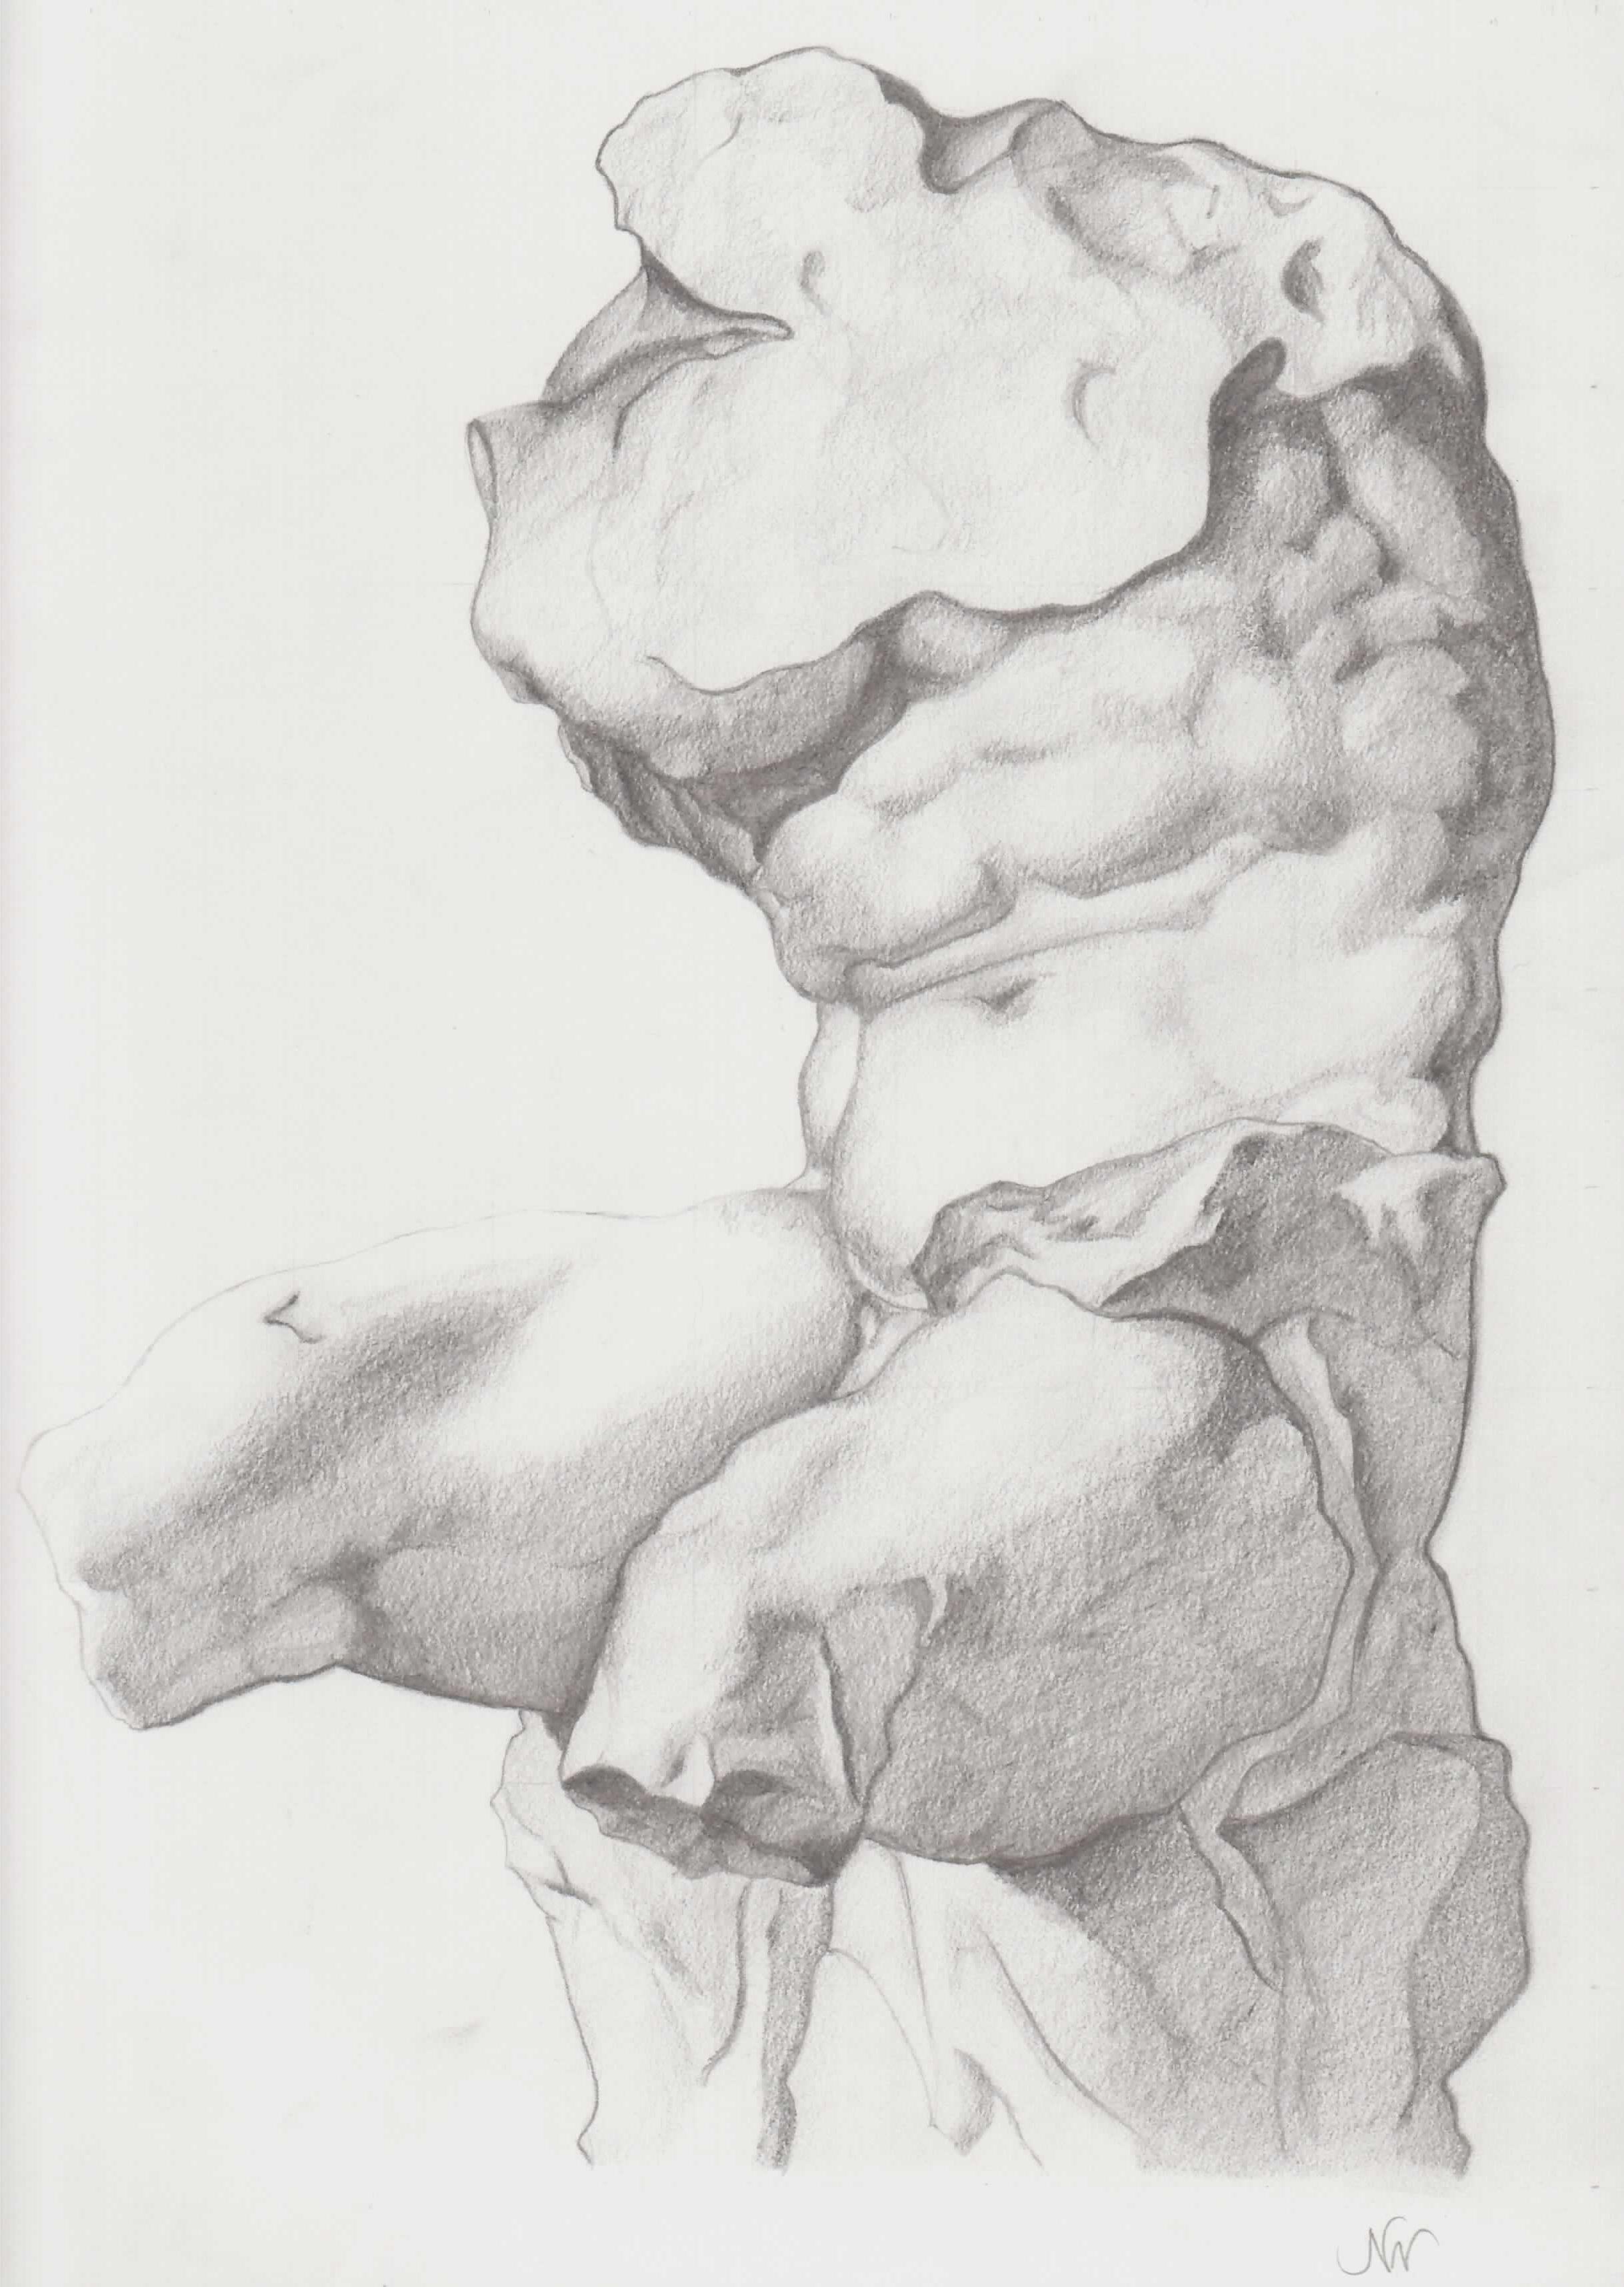 Sculpture, 2010 | graphite, 9 x 12 in